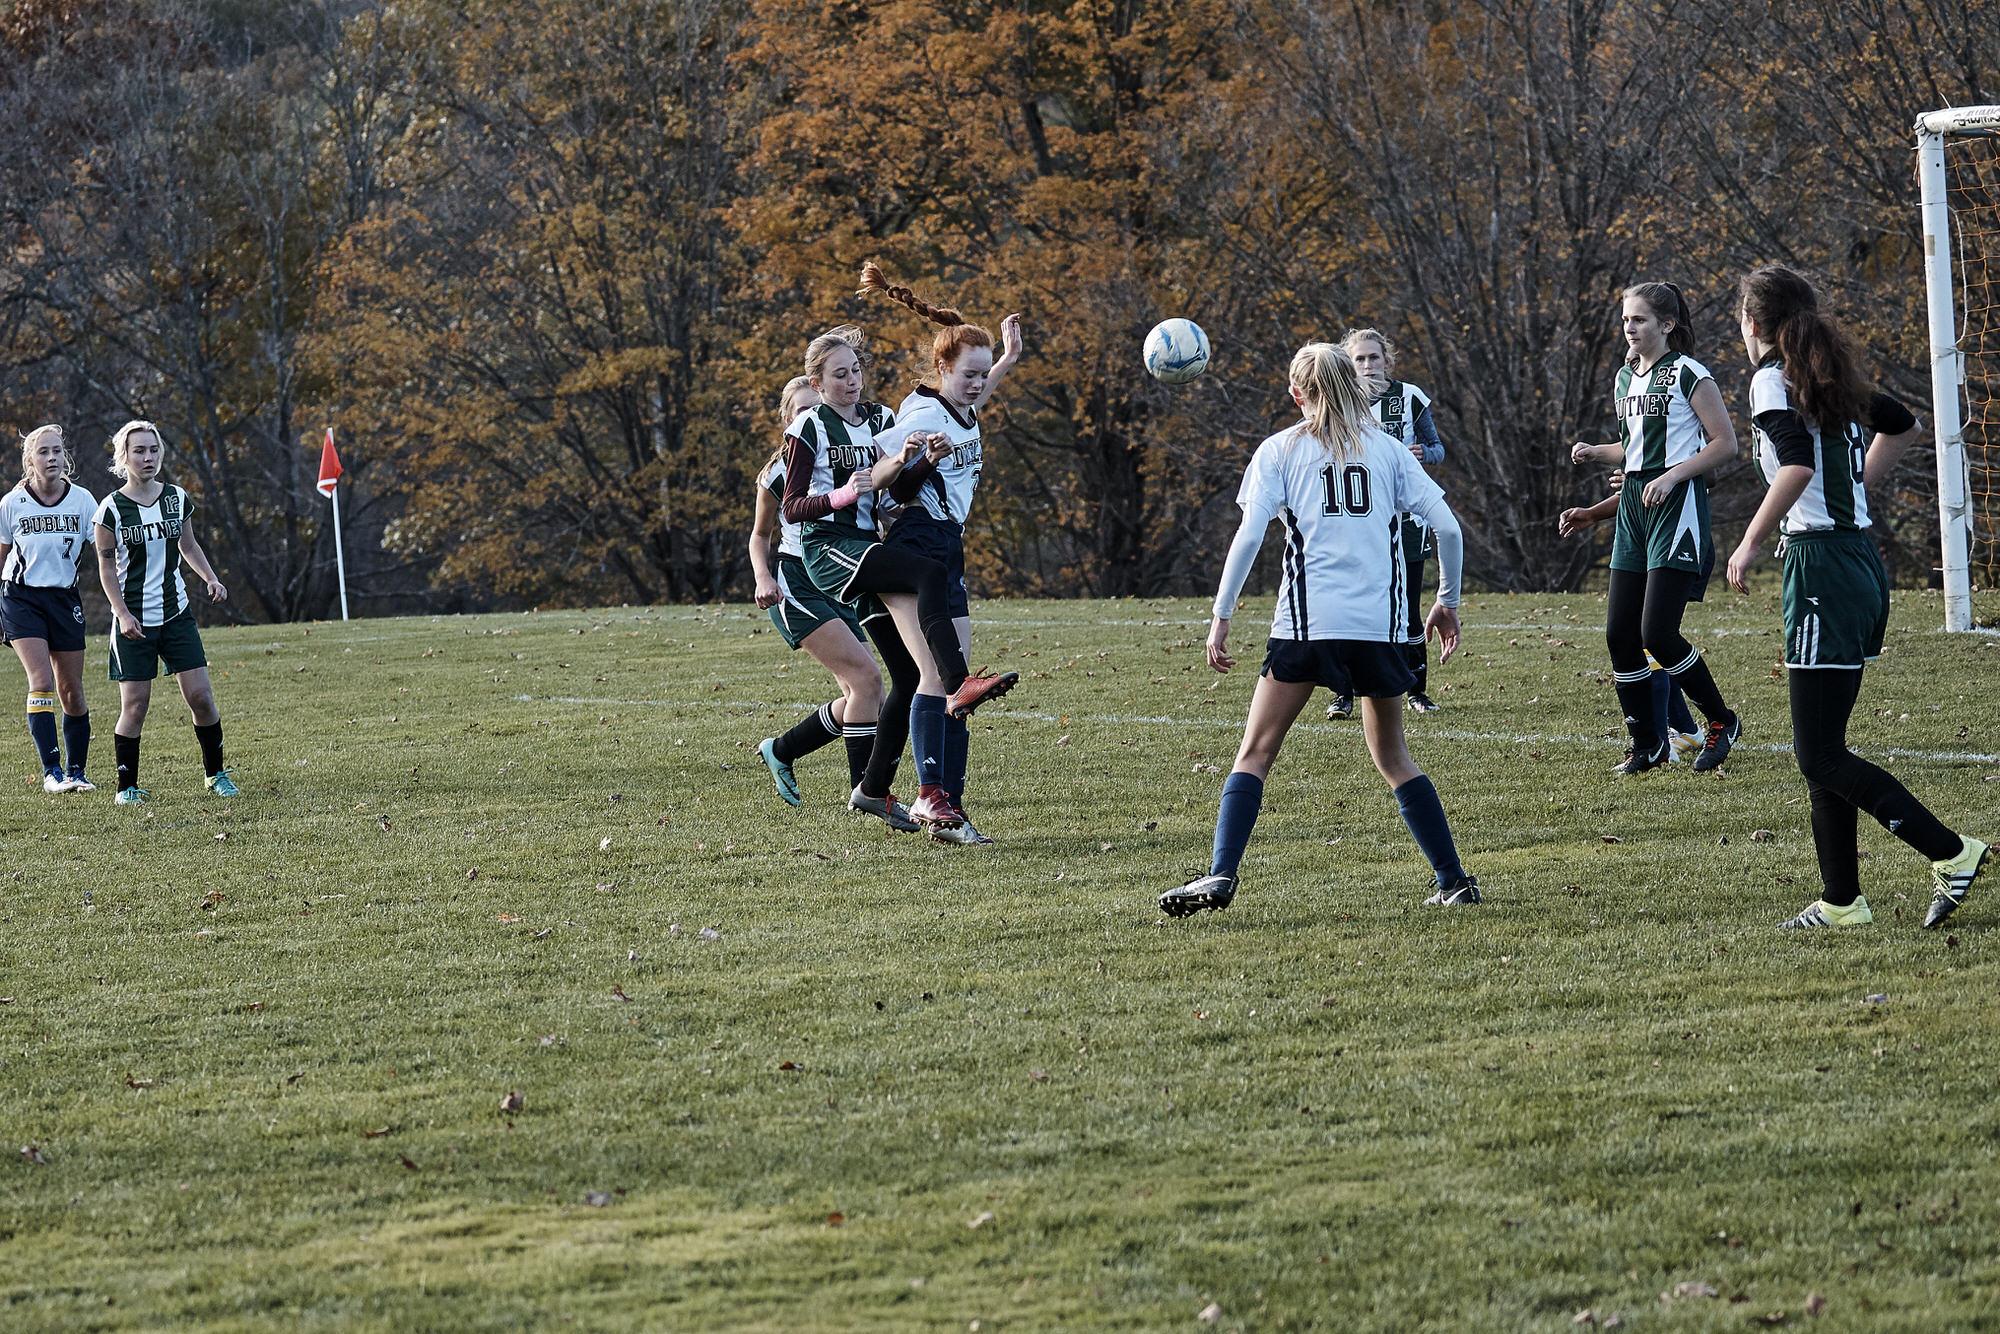 Girls Varsity Soccer vs. Putney School - October 26, 2018 - 042.jpg